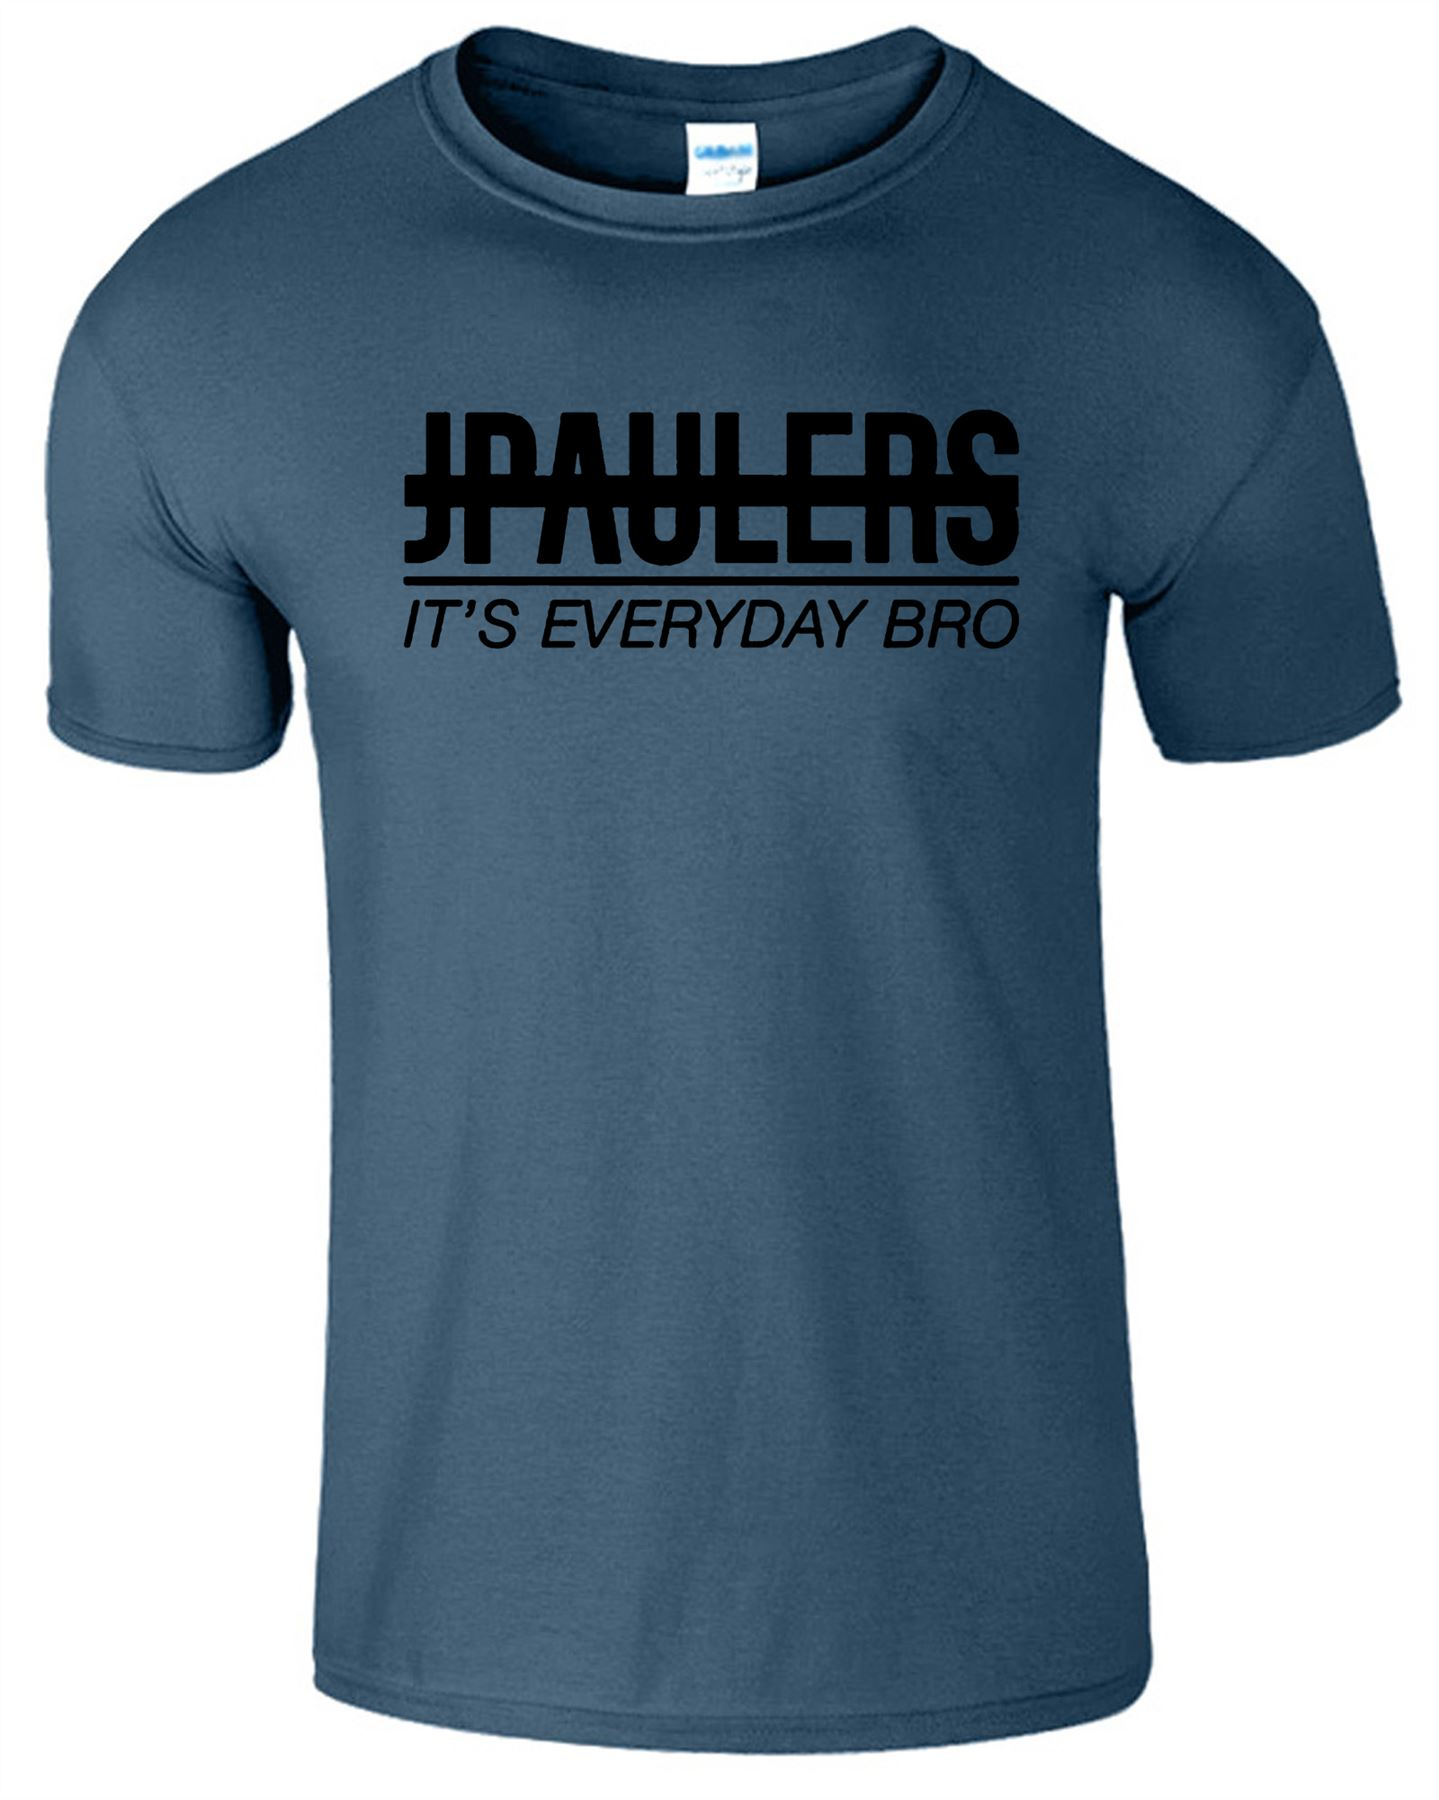 JPAULERS ITS EVERYDAY BRO Kids Girls T Shirt Youtuber Boys JP Gift VLOG T-Shirt